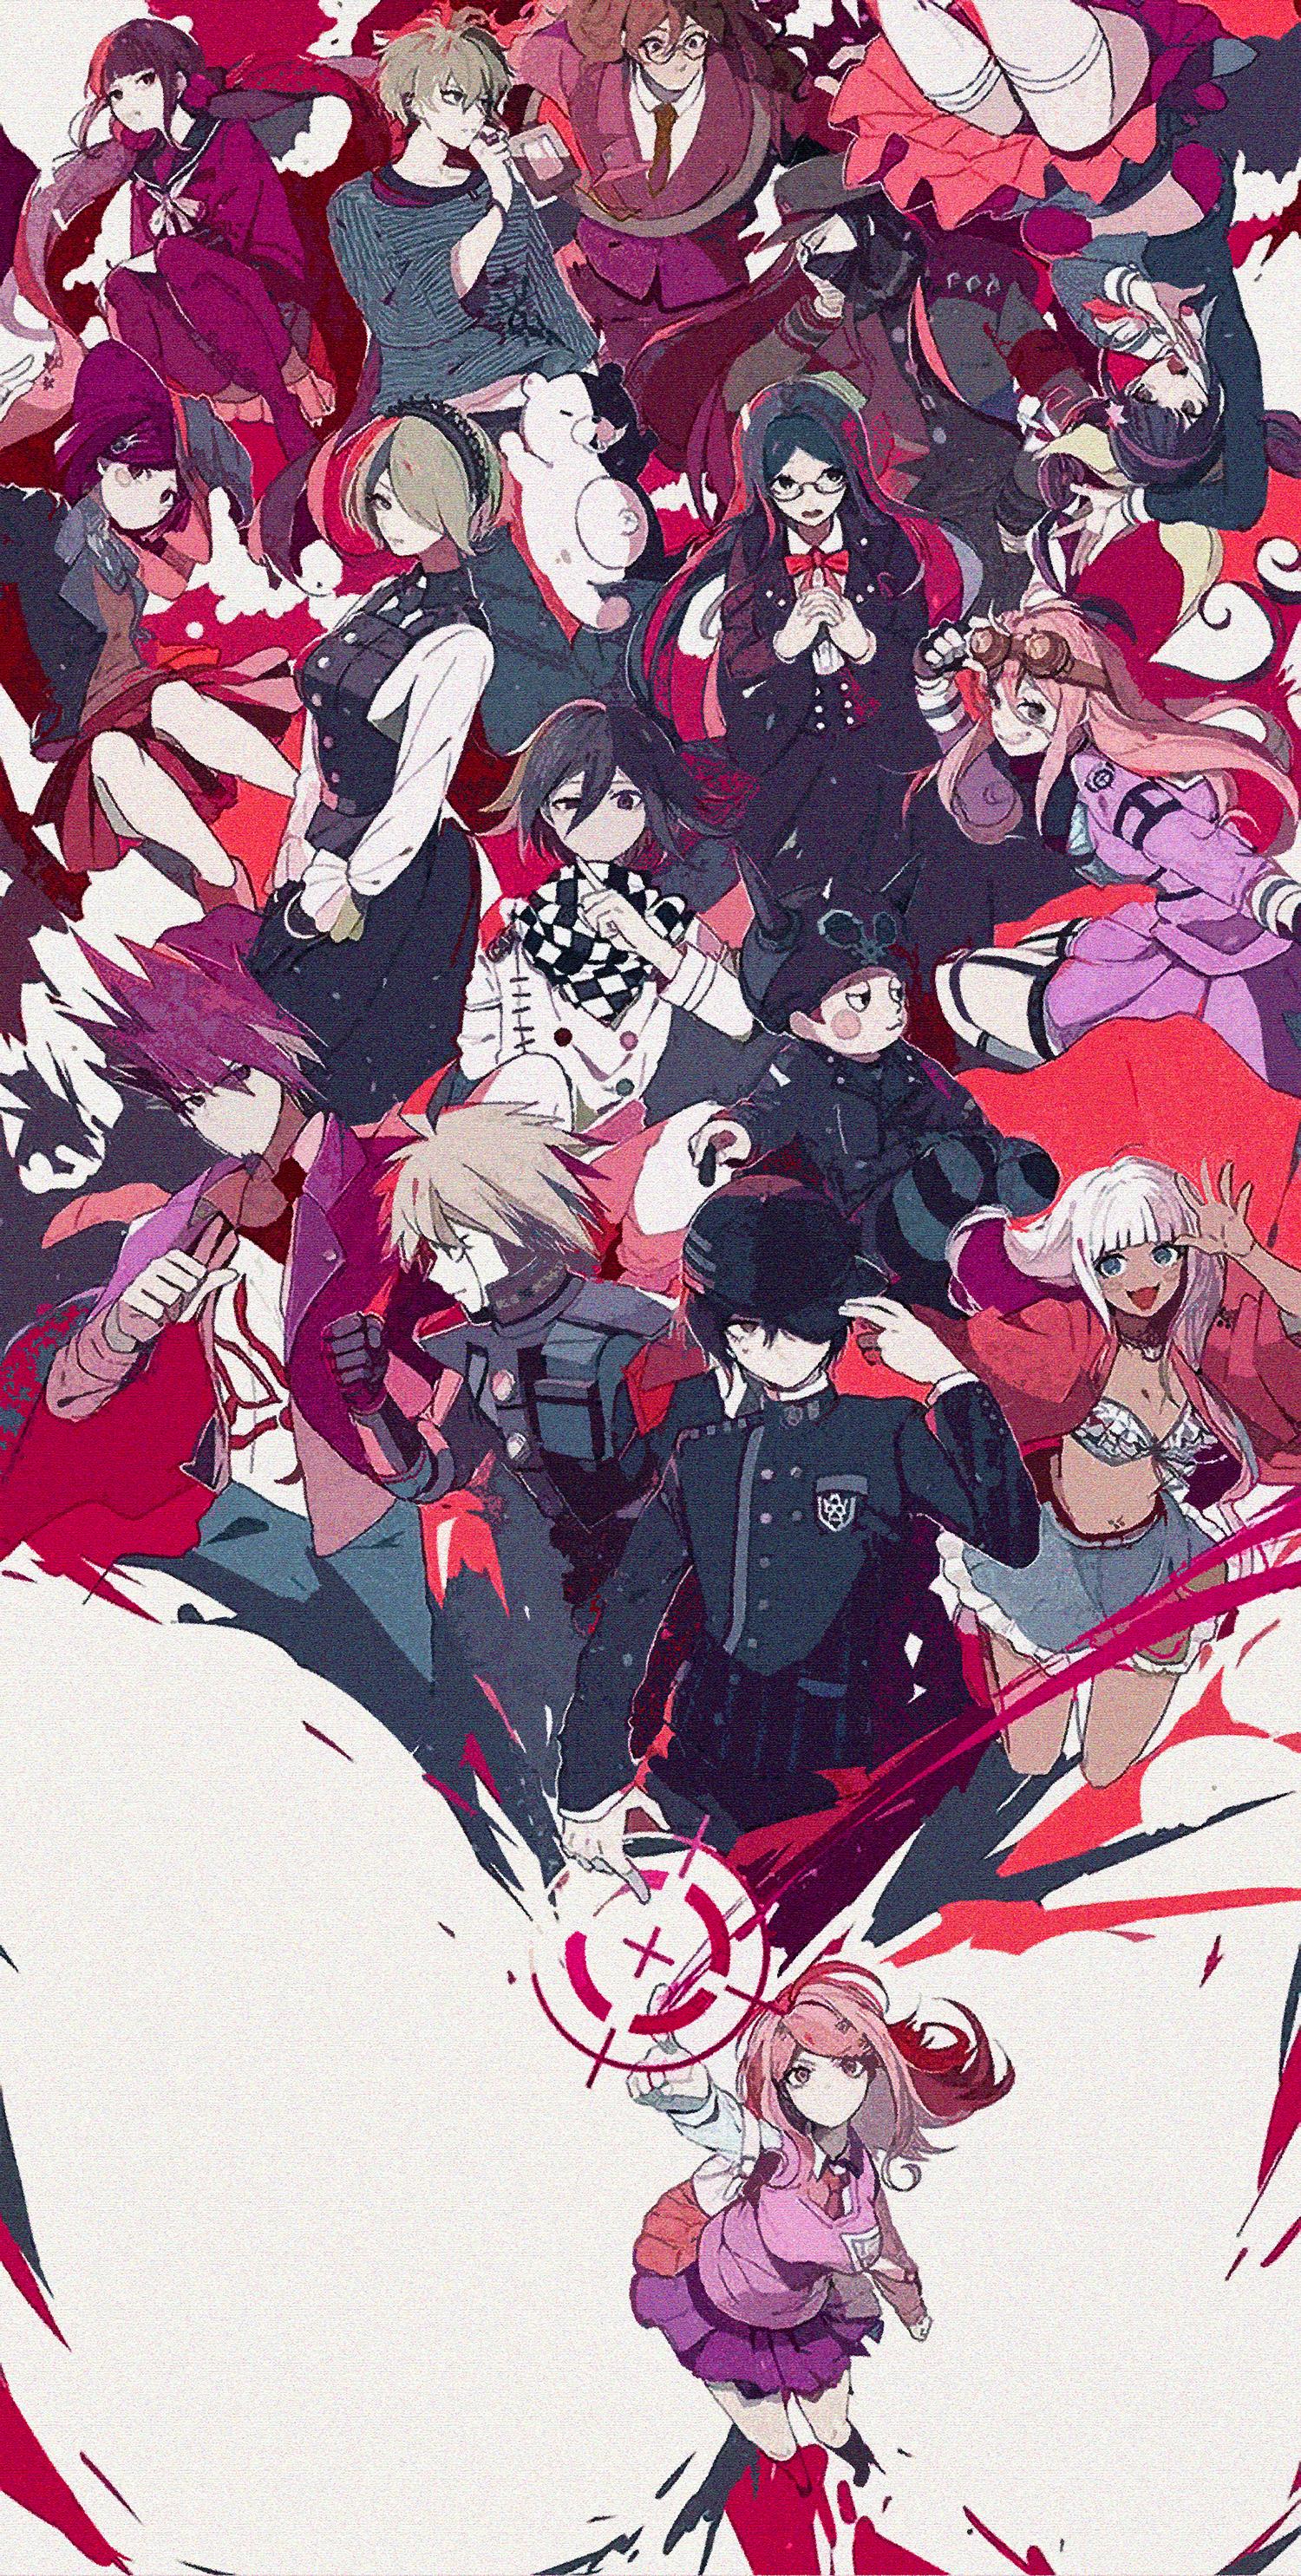 Danganronpa V3 Wallpaper Danganronpa Danganronpa V3 Anime